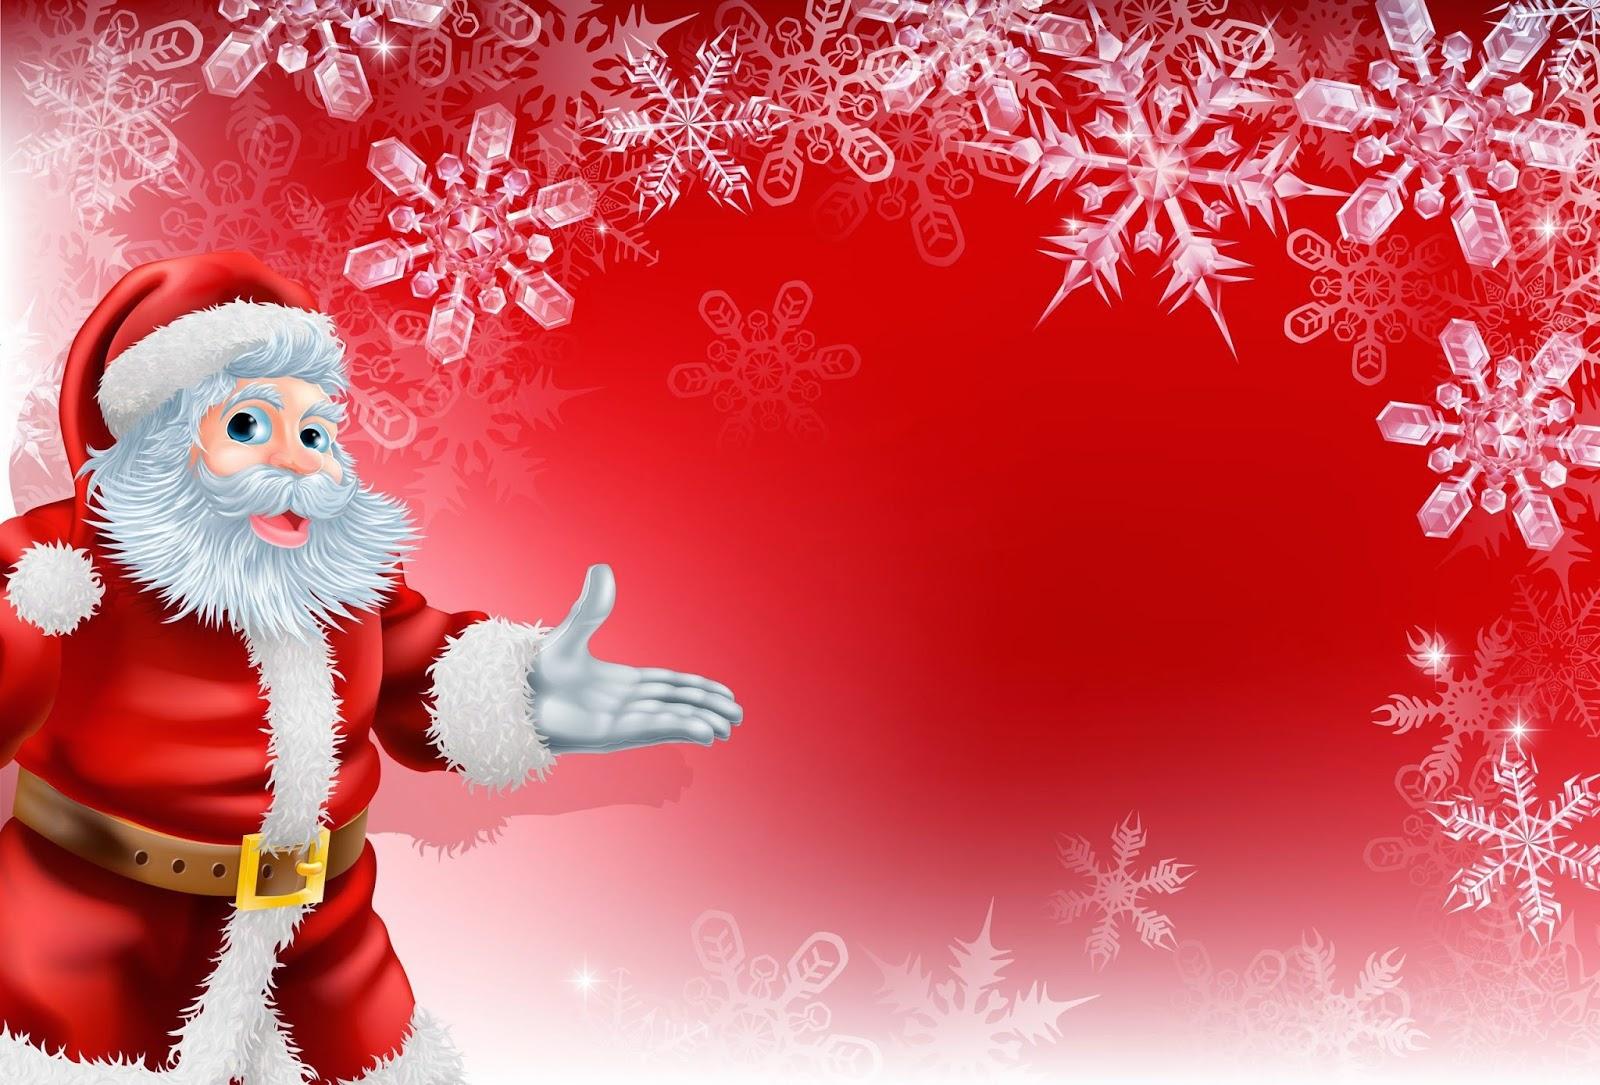 Santa-Claus-cartoon-Full-HD-wallpaper-for-desktop-pc-mac-laptop.jpg